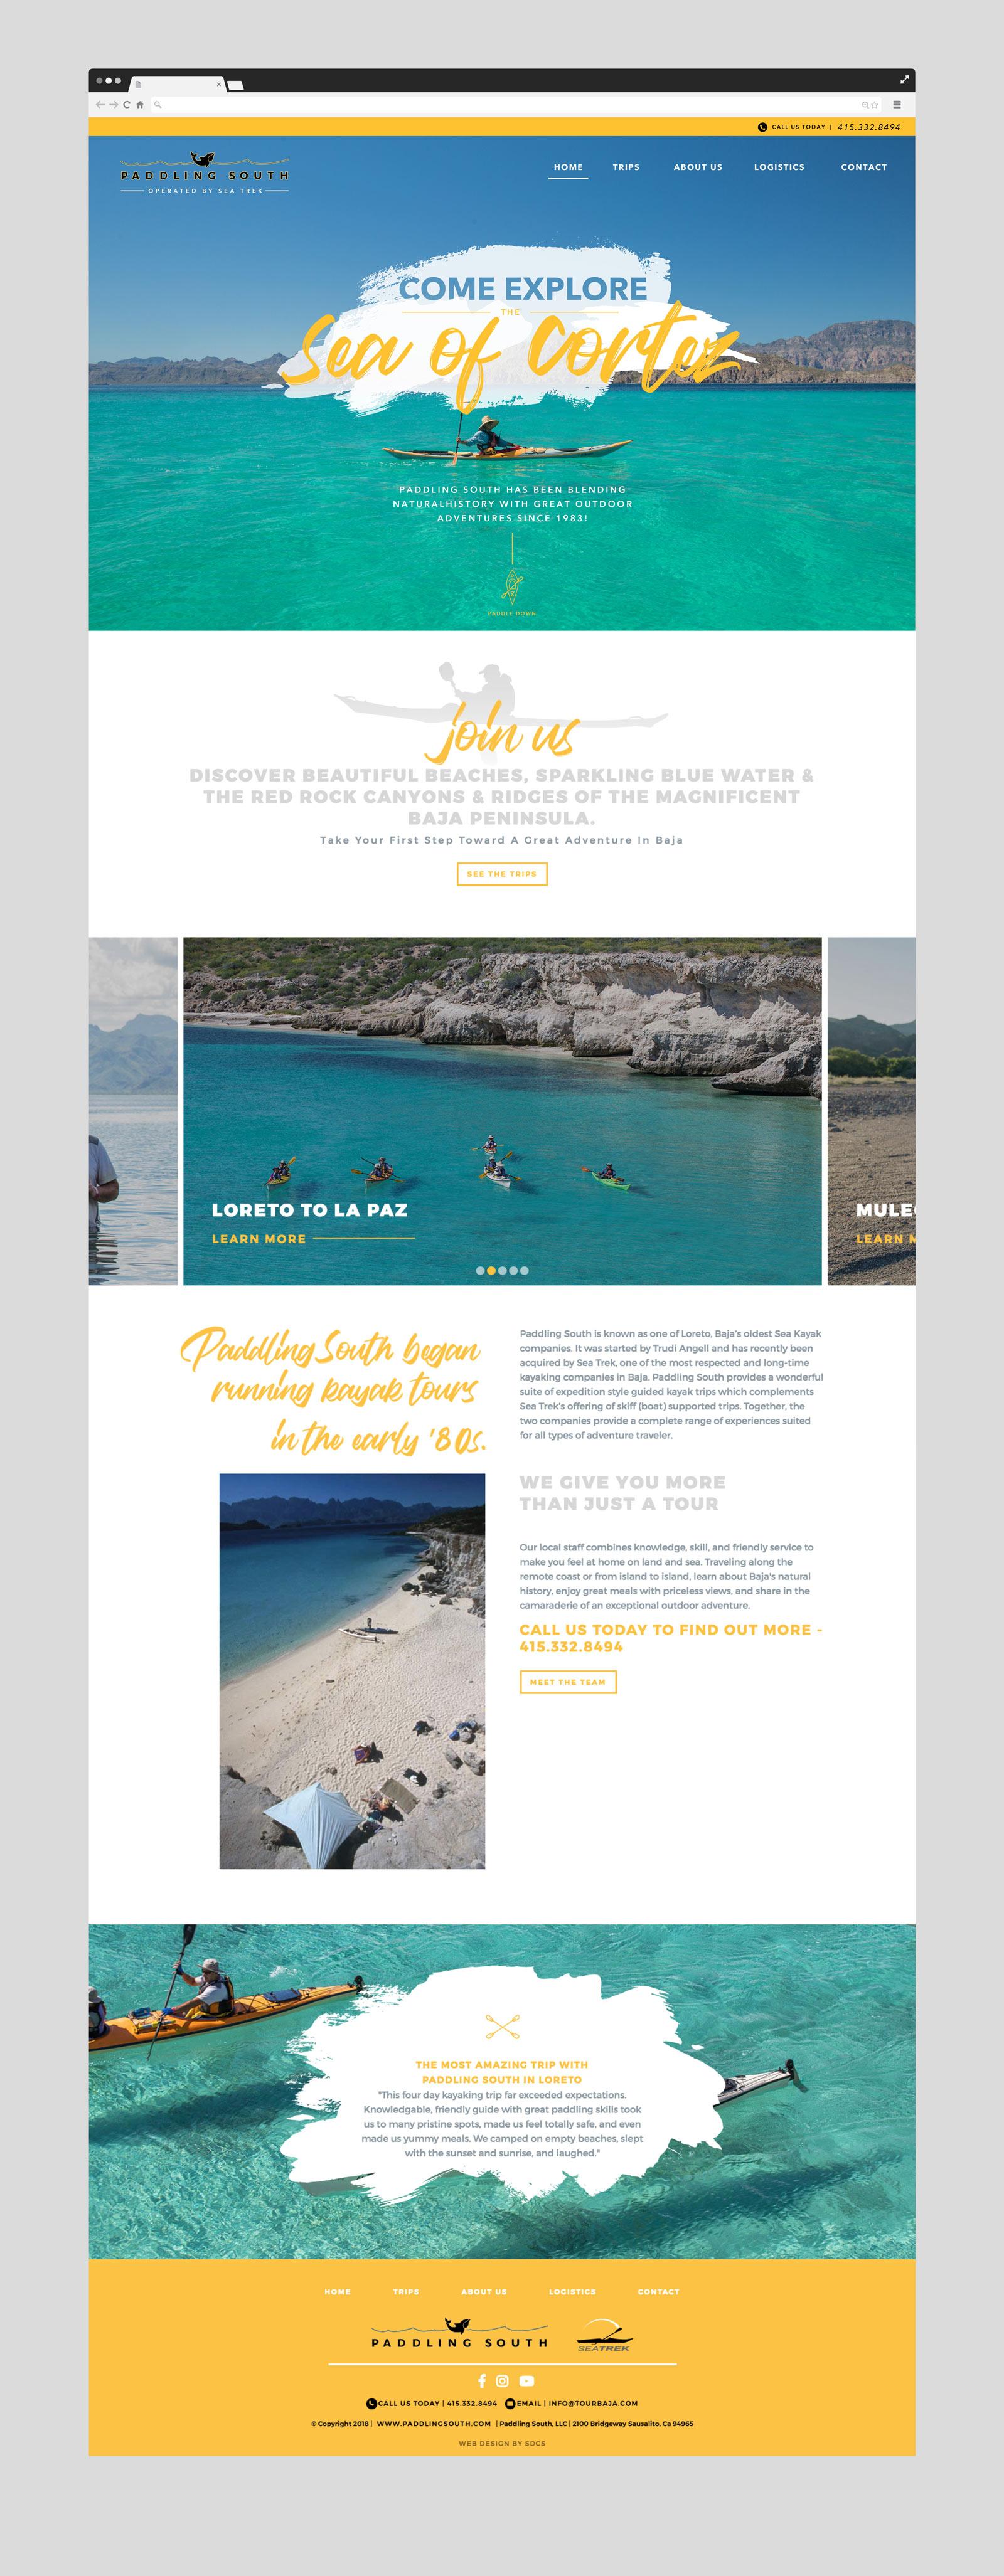 Paddling-South-Design-web.jpg